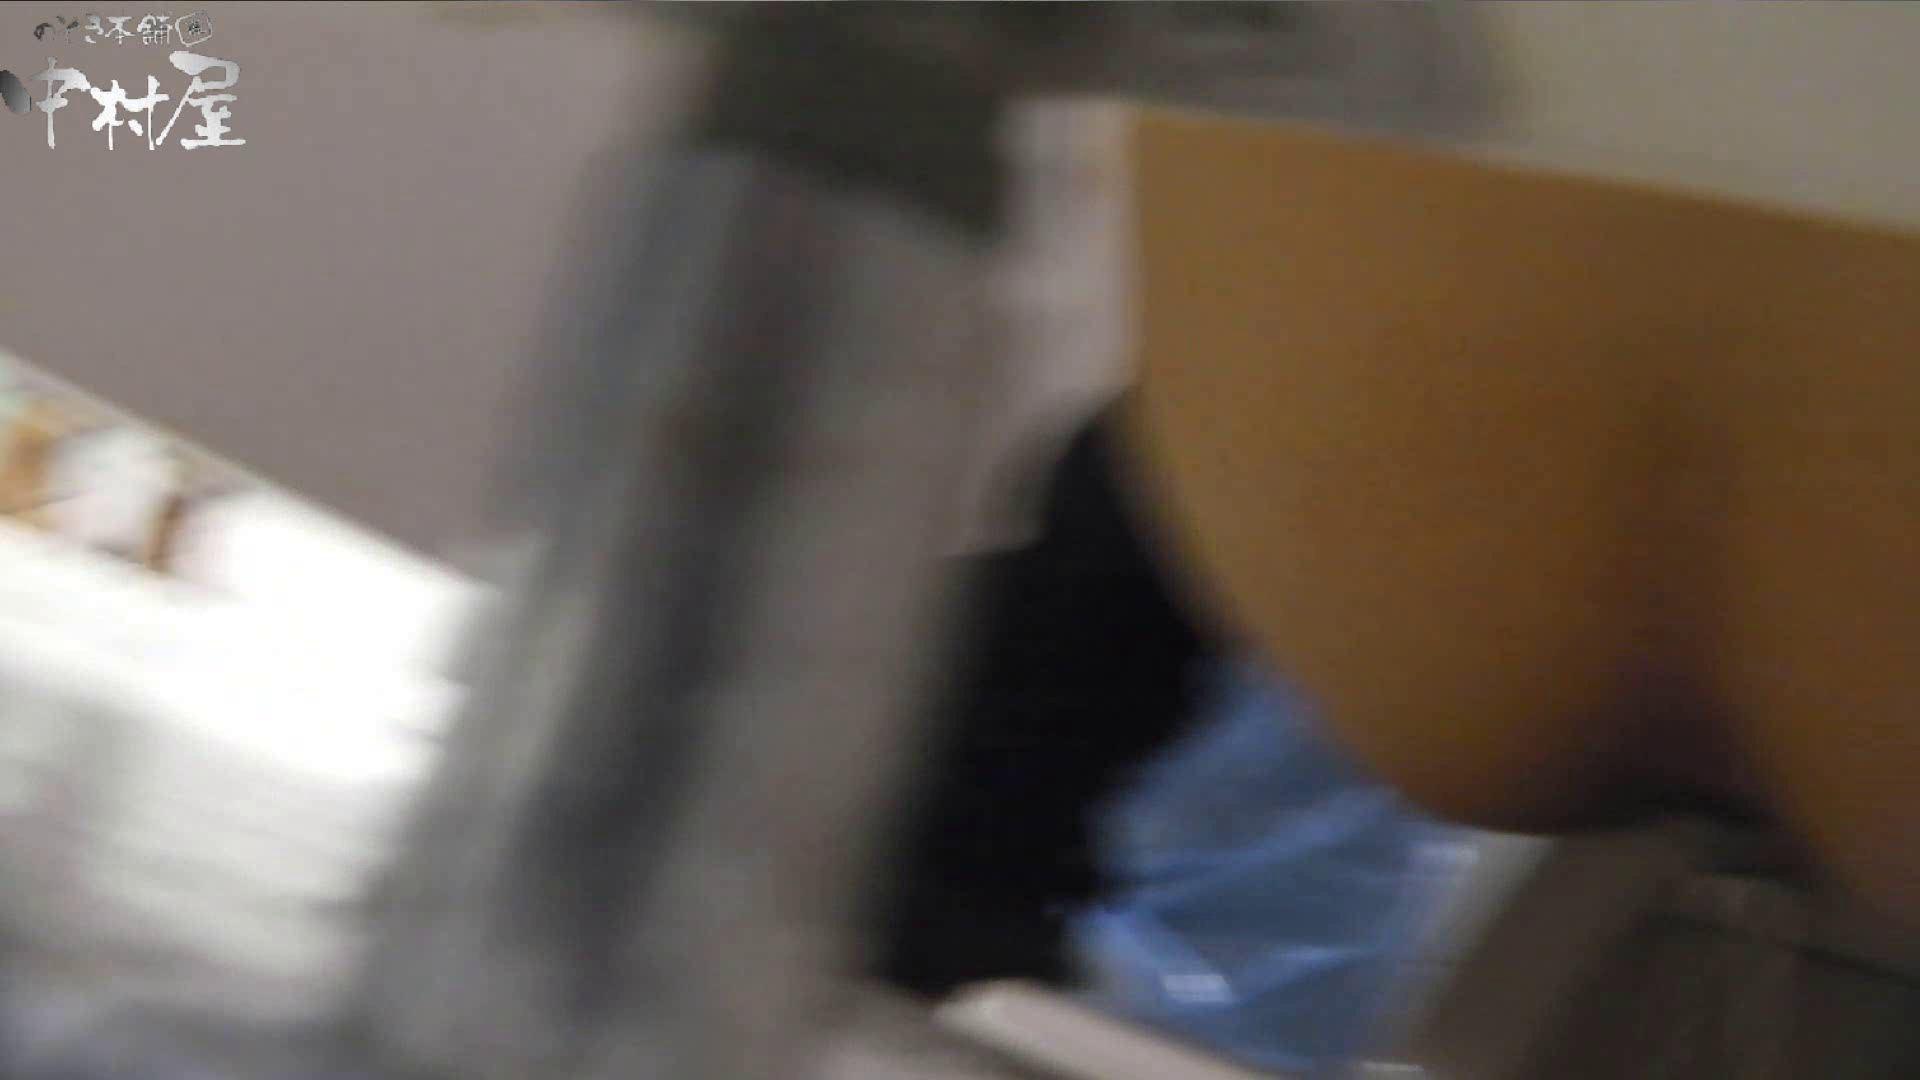 vol.34 命がけ潜伏洗面所! アソコの毛が長髪な件 後編 洗面所 盗撮画像 108枚